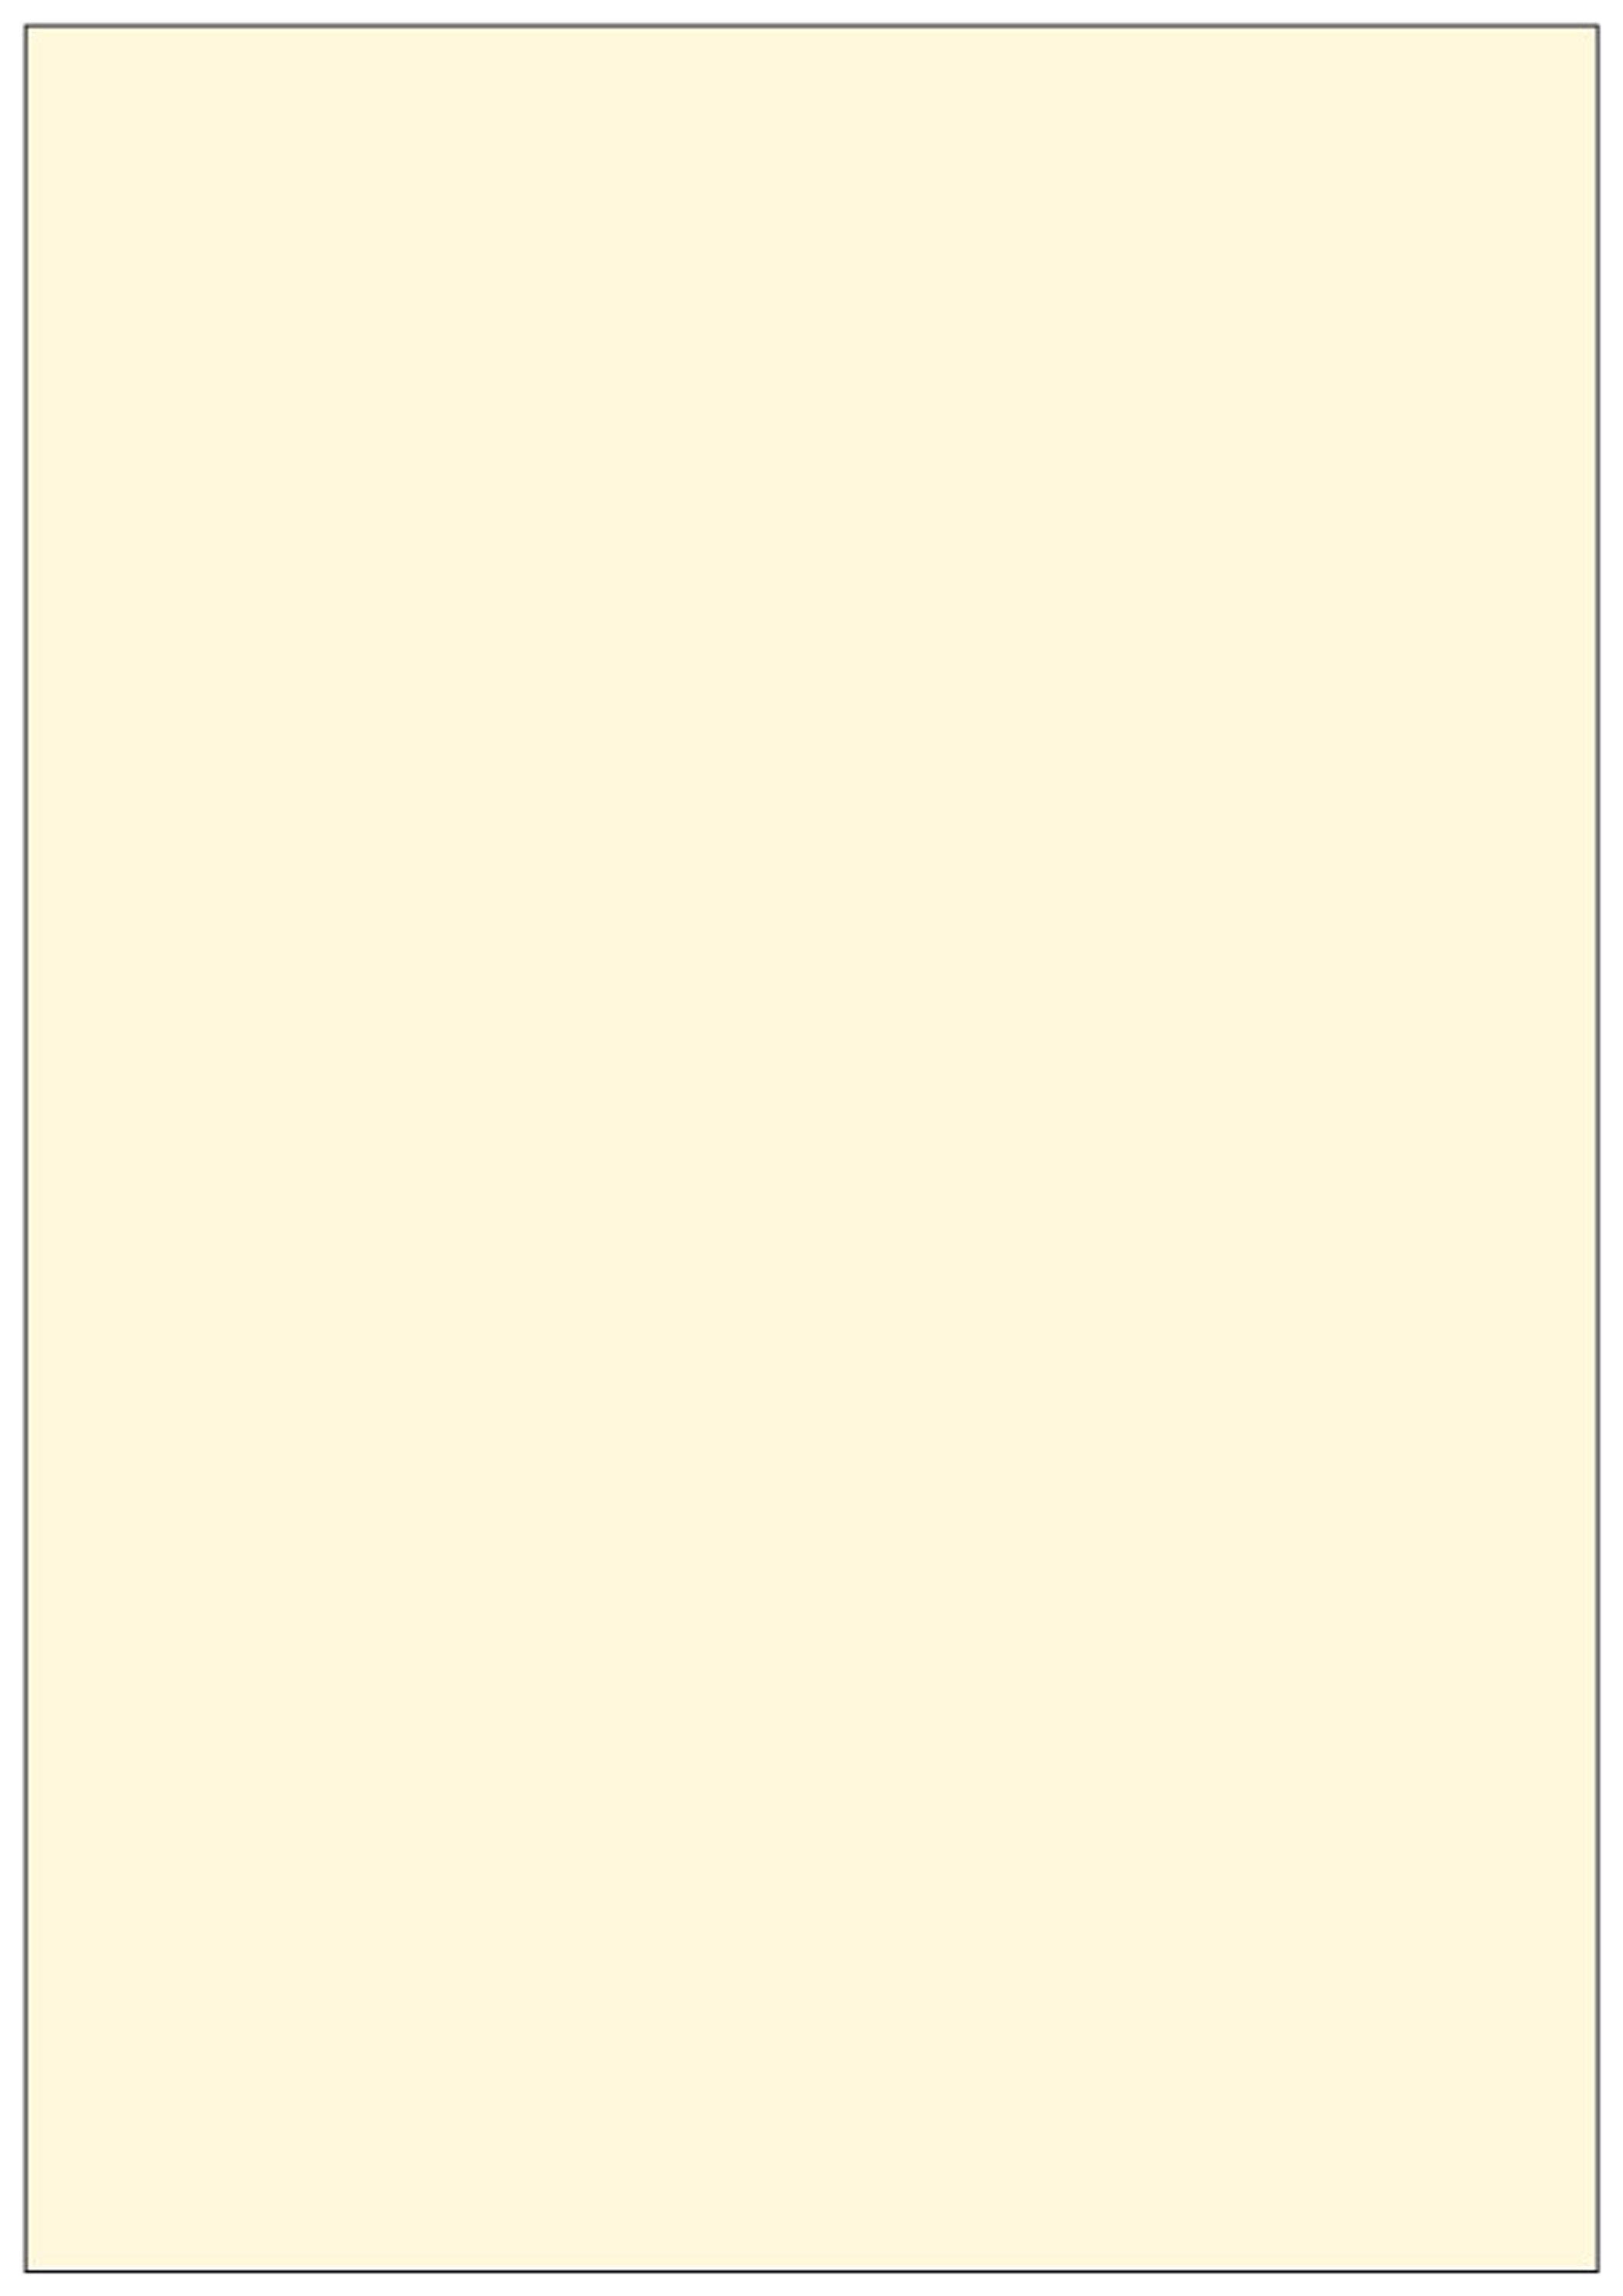 Papyrus Rainbow Pastell Kopierpapier DIN A4 farbig 120-160 g//m² Druckerpapier